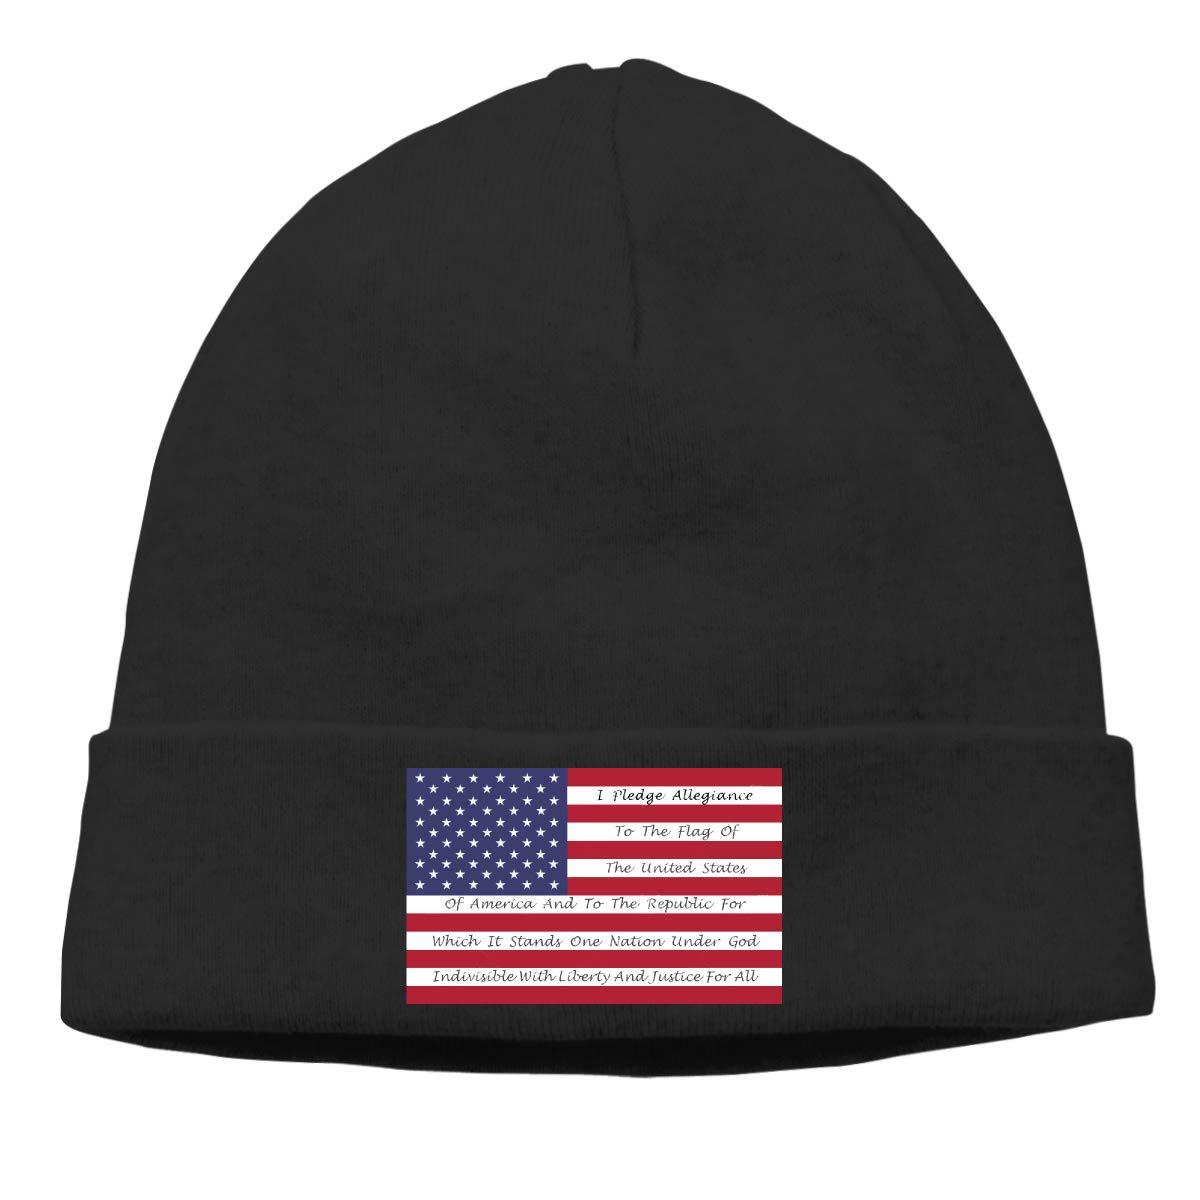 American Flag Pledge of Allegiance Beanie Hats Cap Men Women Oversized Baggy Skull Cap Ski Slouchy Hat